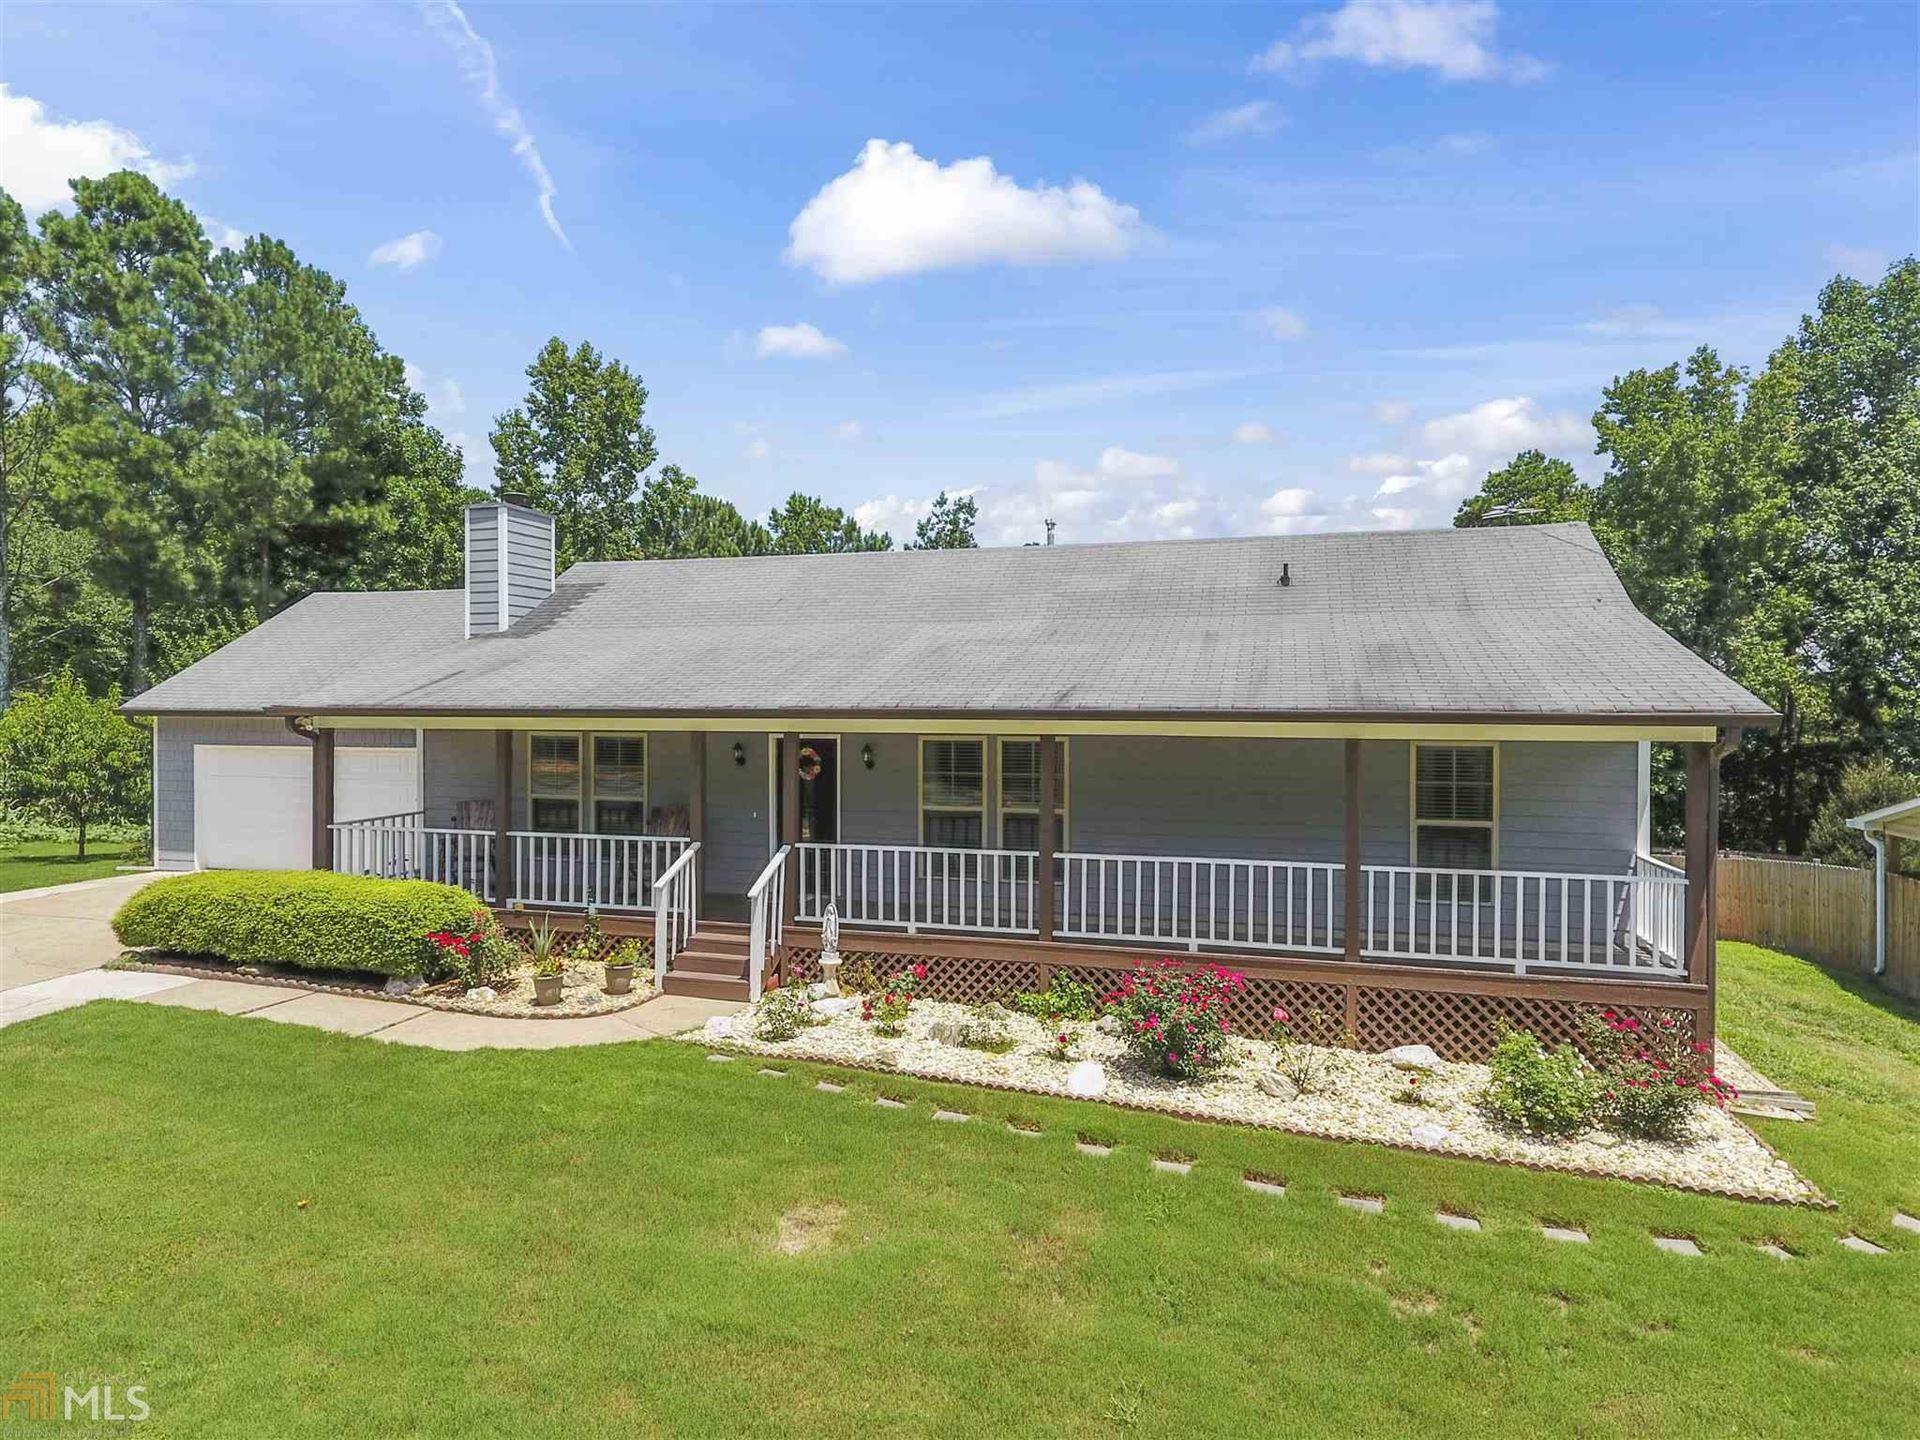 5855 Maple Creek Dr, Buford, GA 30518 - #: 8832399